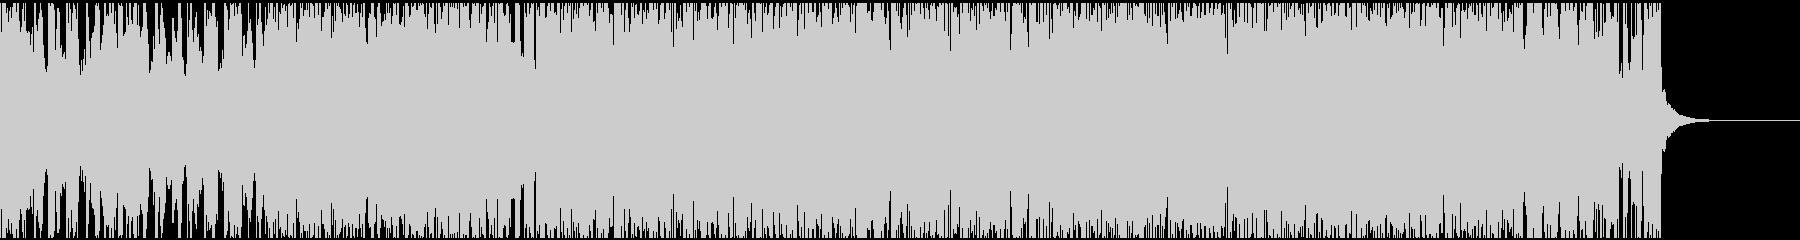 EDM、HOUSE系オープニングBGM等の未再生の波形